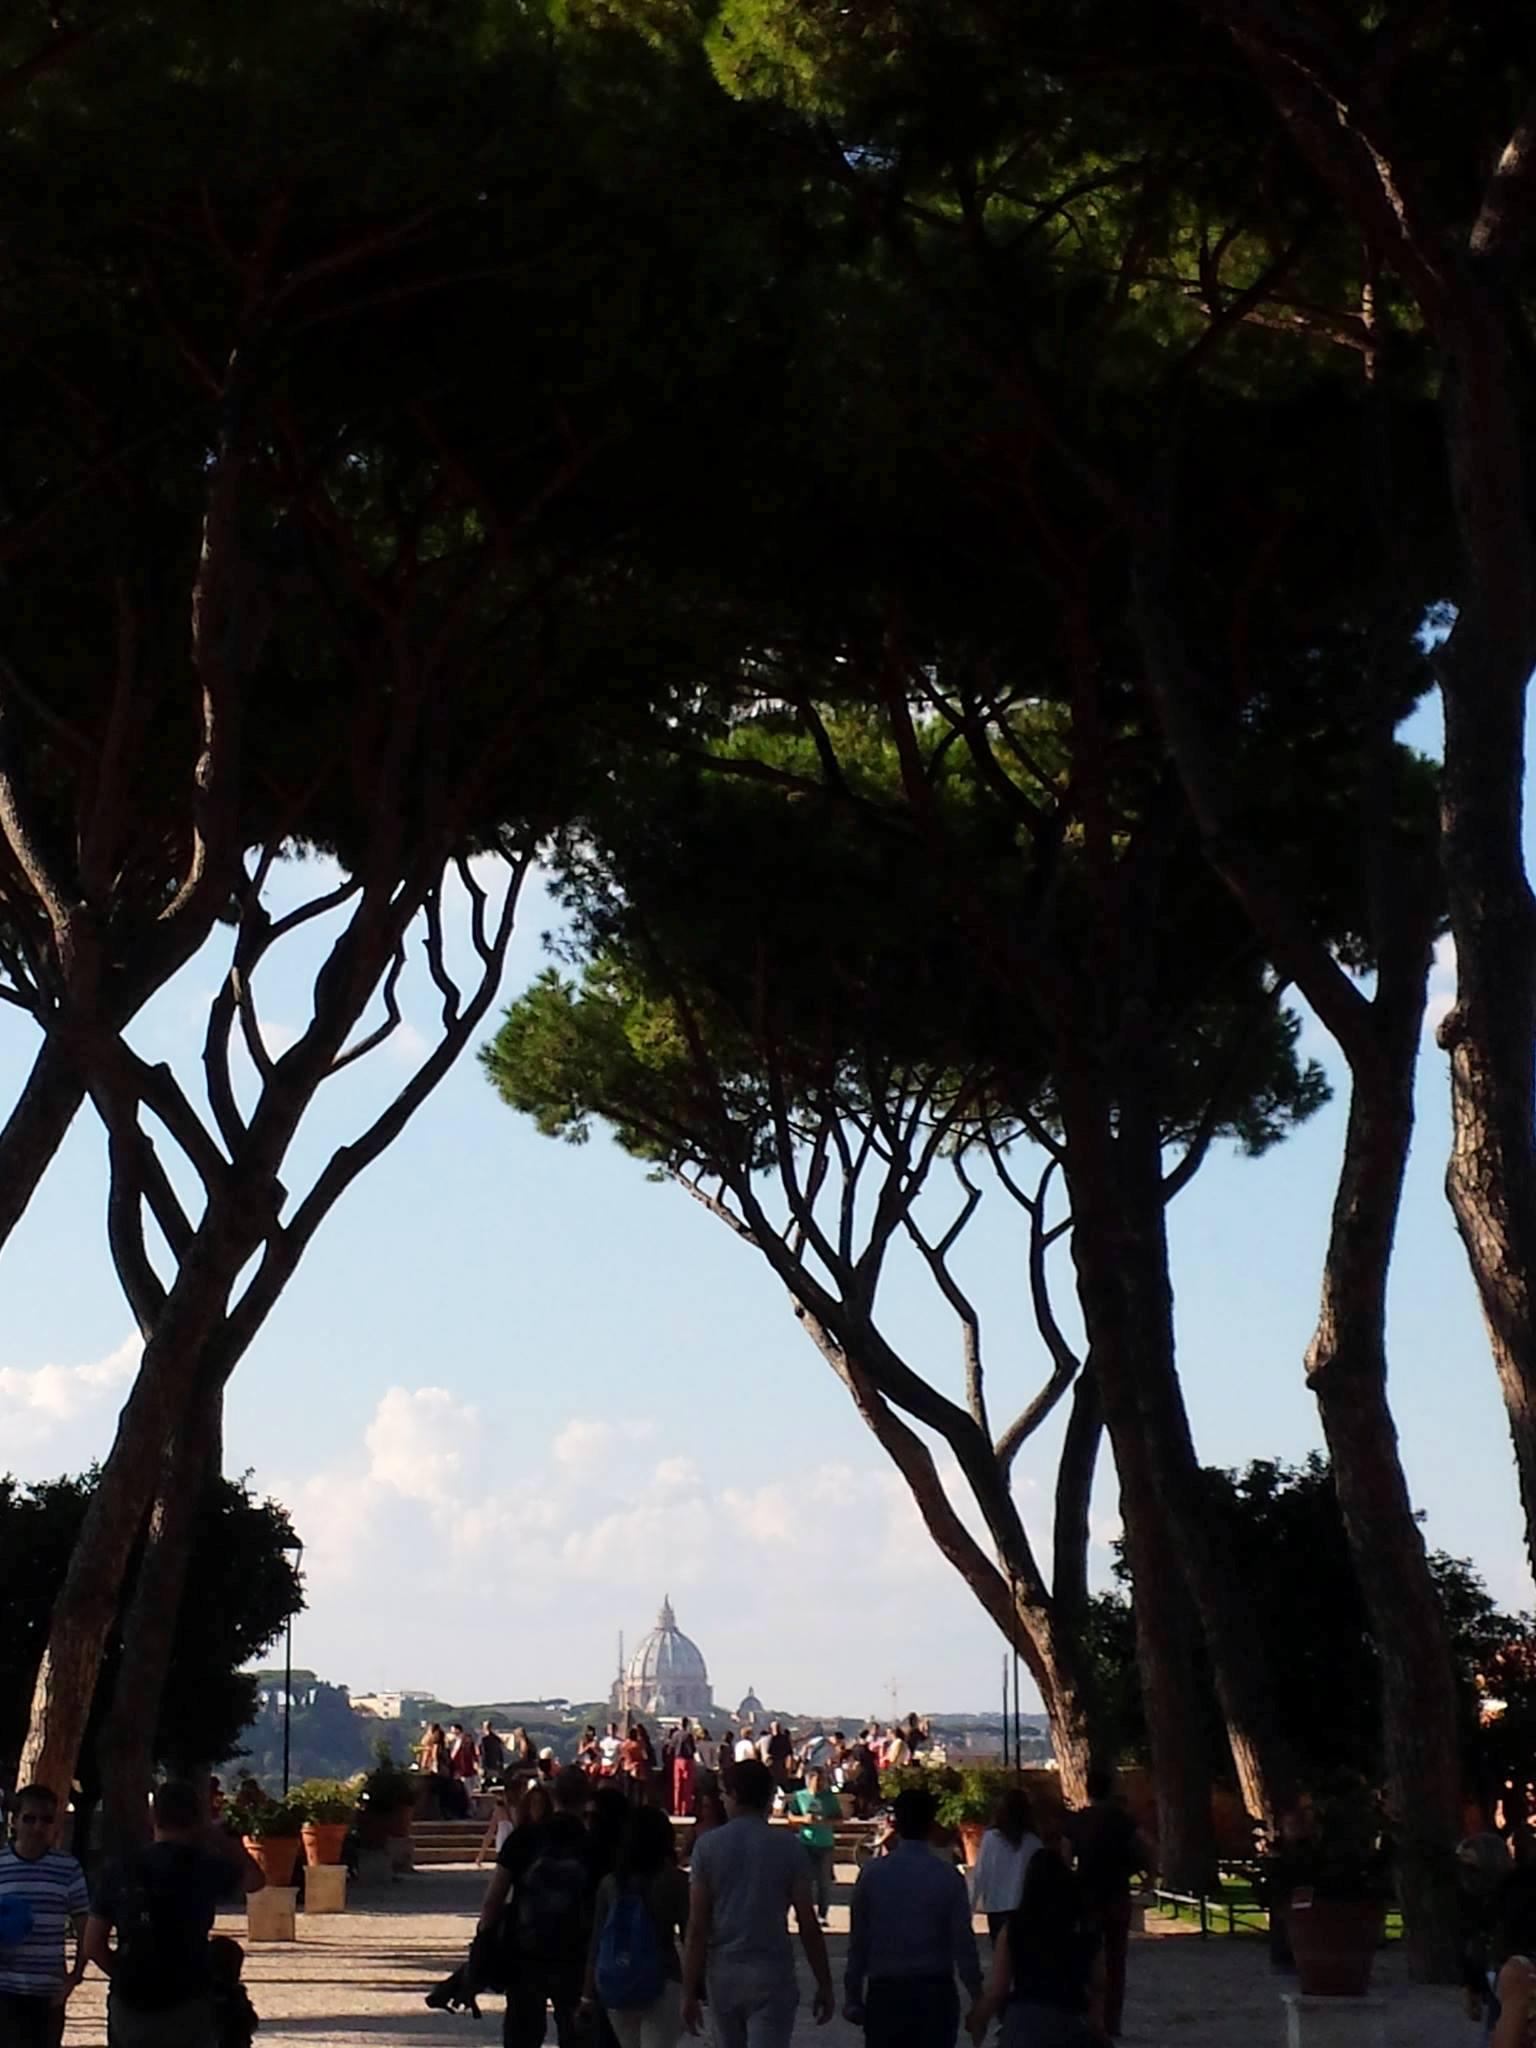 Caminhando por Roma - GIARDINO DEGLI ARANCI